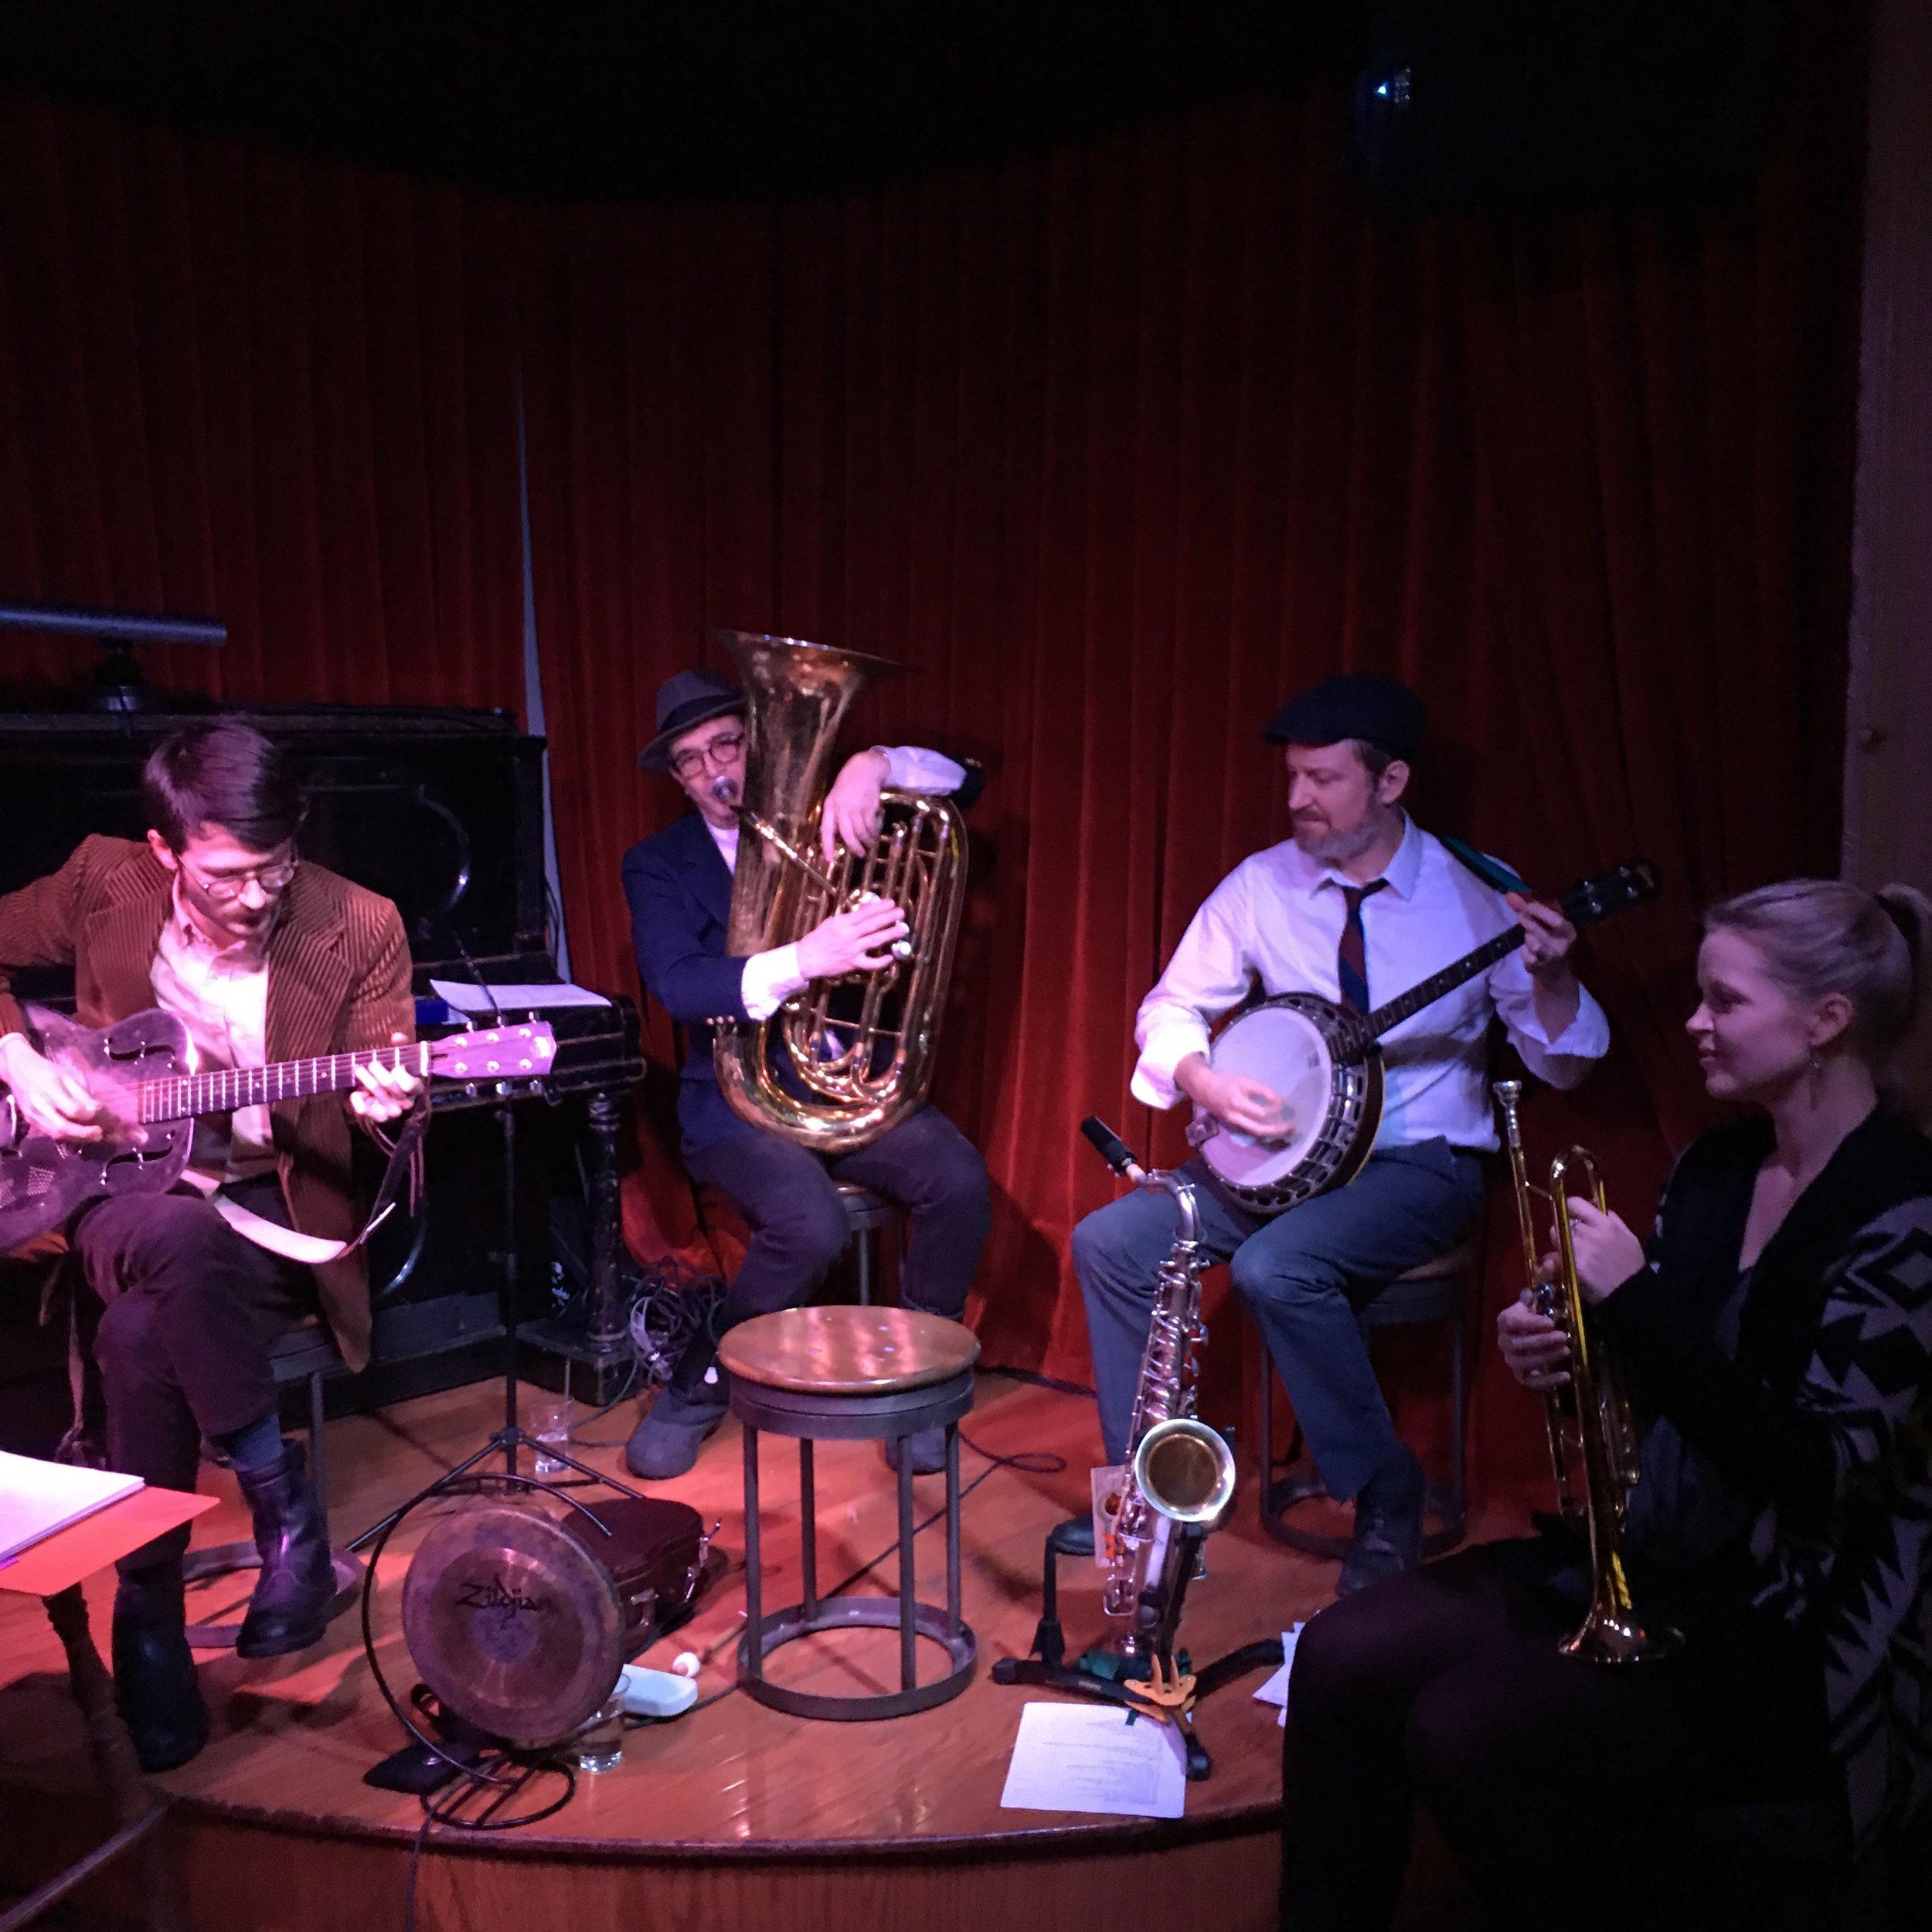 Red Room, February 9th, 2017, with L-R: Adam Brisbin, resonator guitar; David Ostwald, tuba; Angus Loten, tenor banjo; and Bria Skonberg, trumpet.